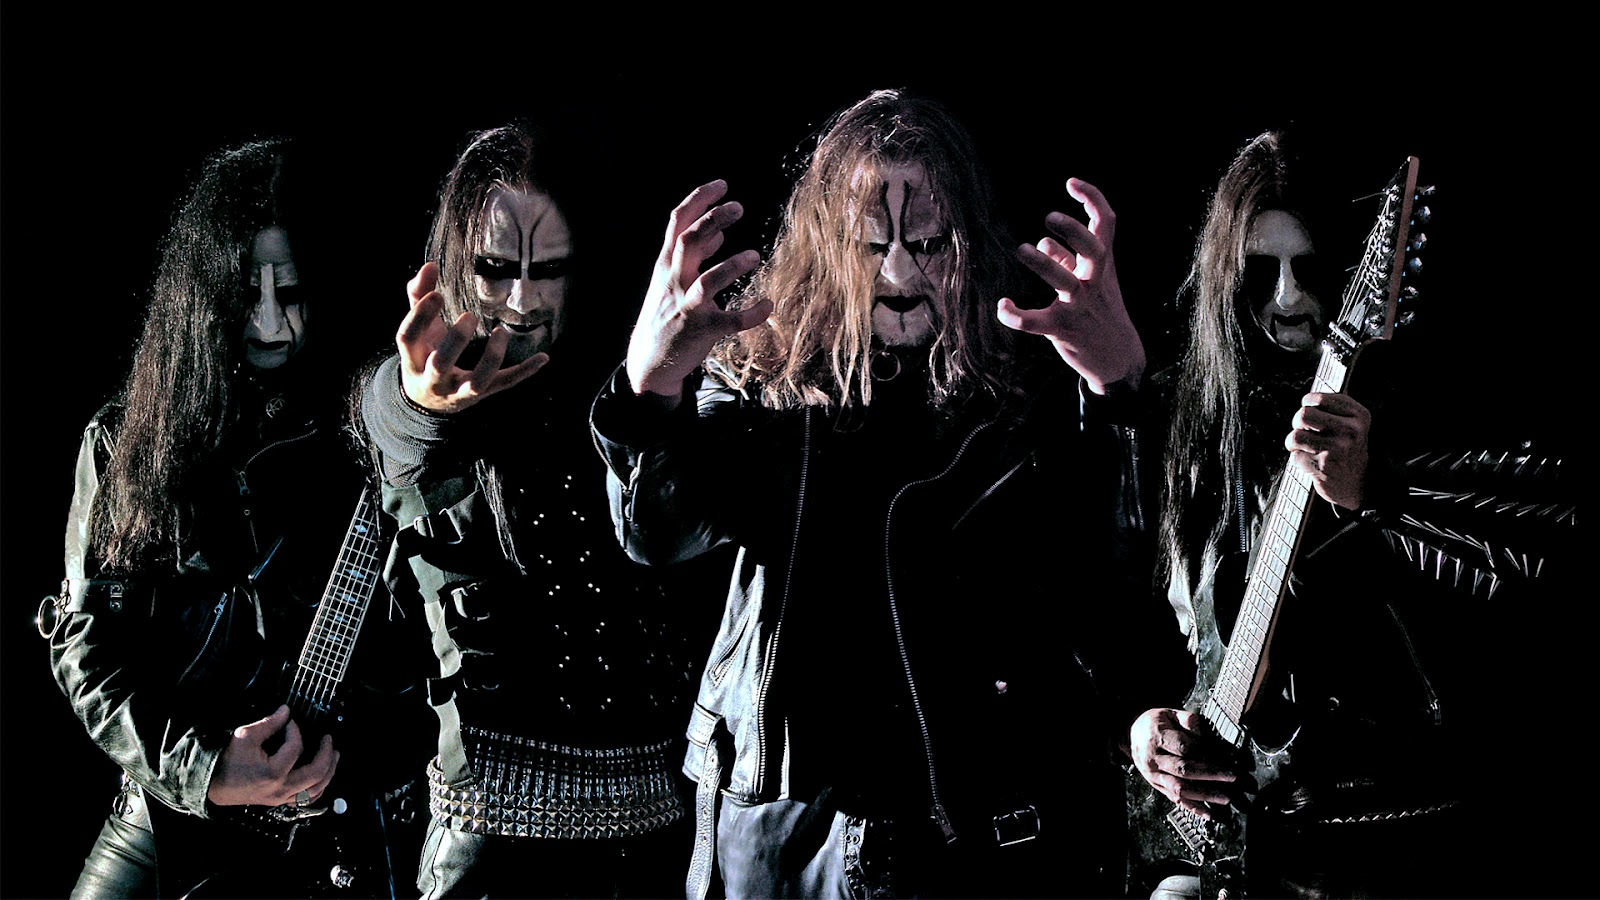 Download HD Wallpapers Metal Bands Gallery